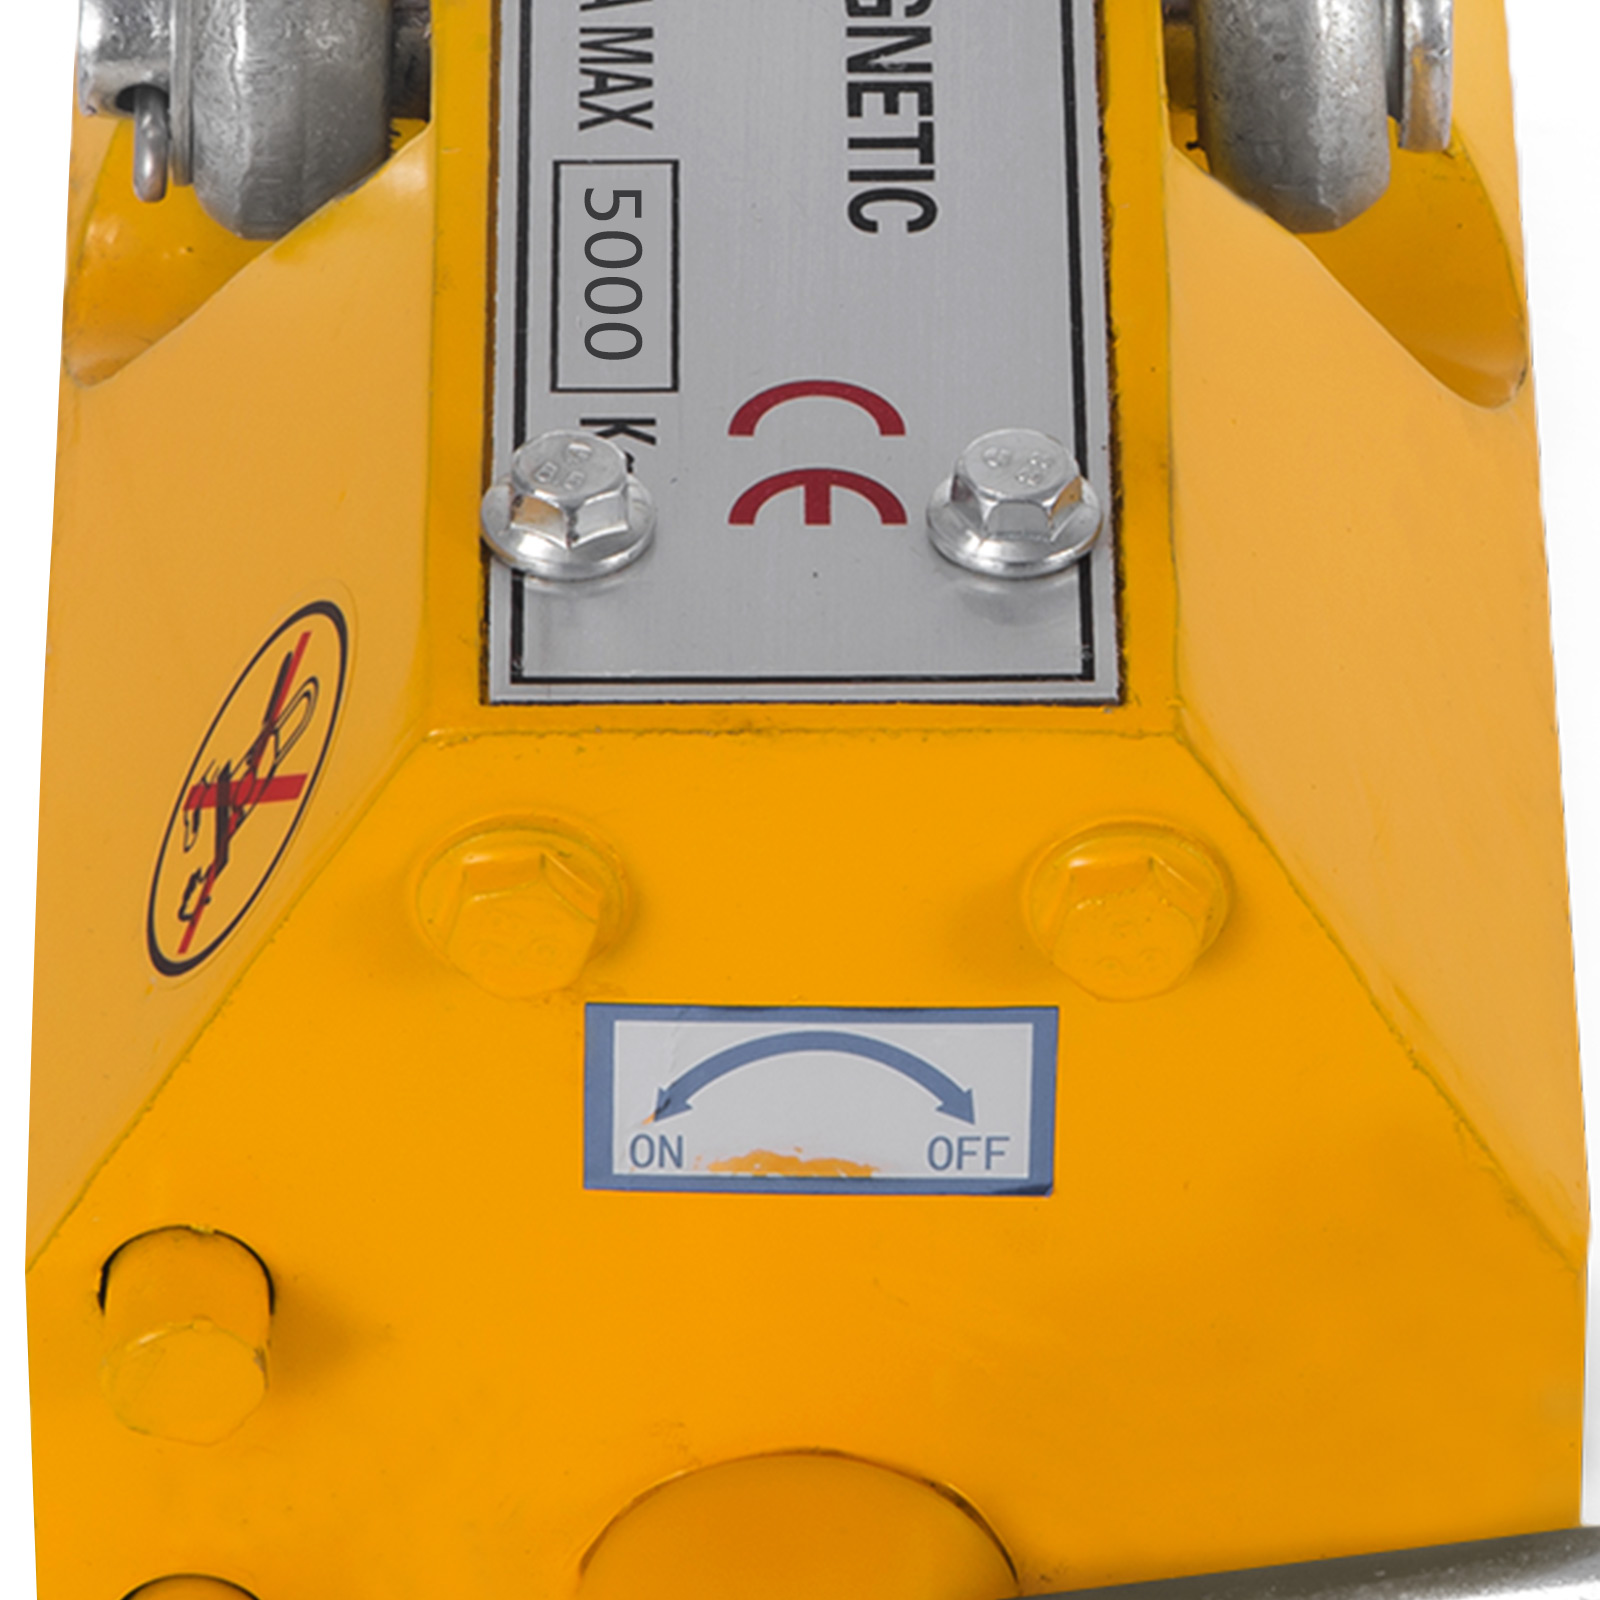 100-300-600-1000KG-Steel-Magnetic-Lifter-Heavy-Duty-Crane-Hoist-Lifting-Magnet miniature 117